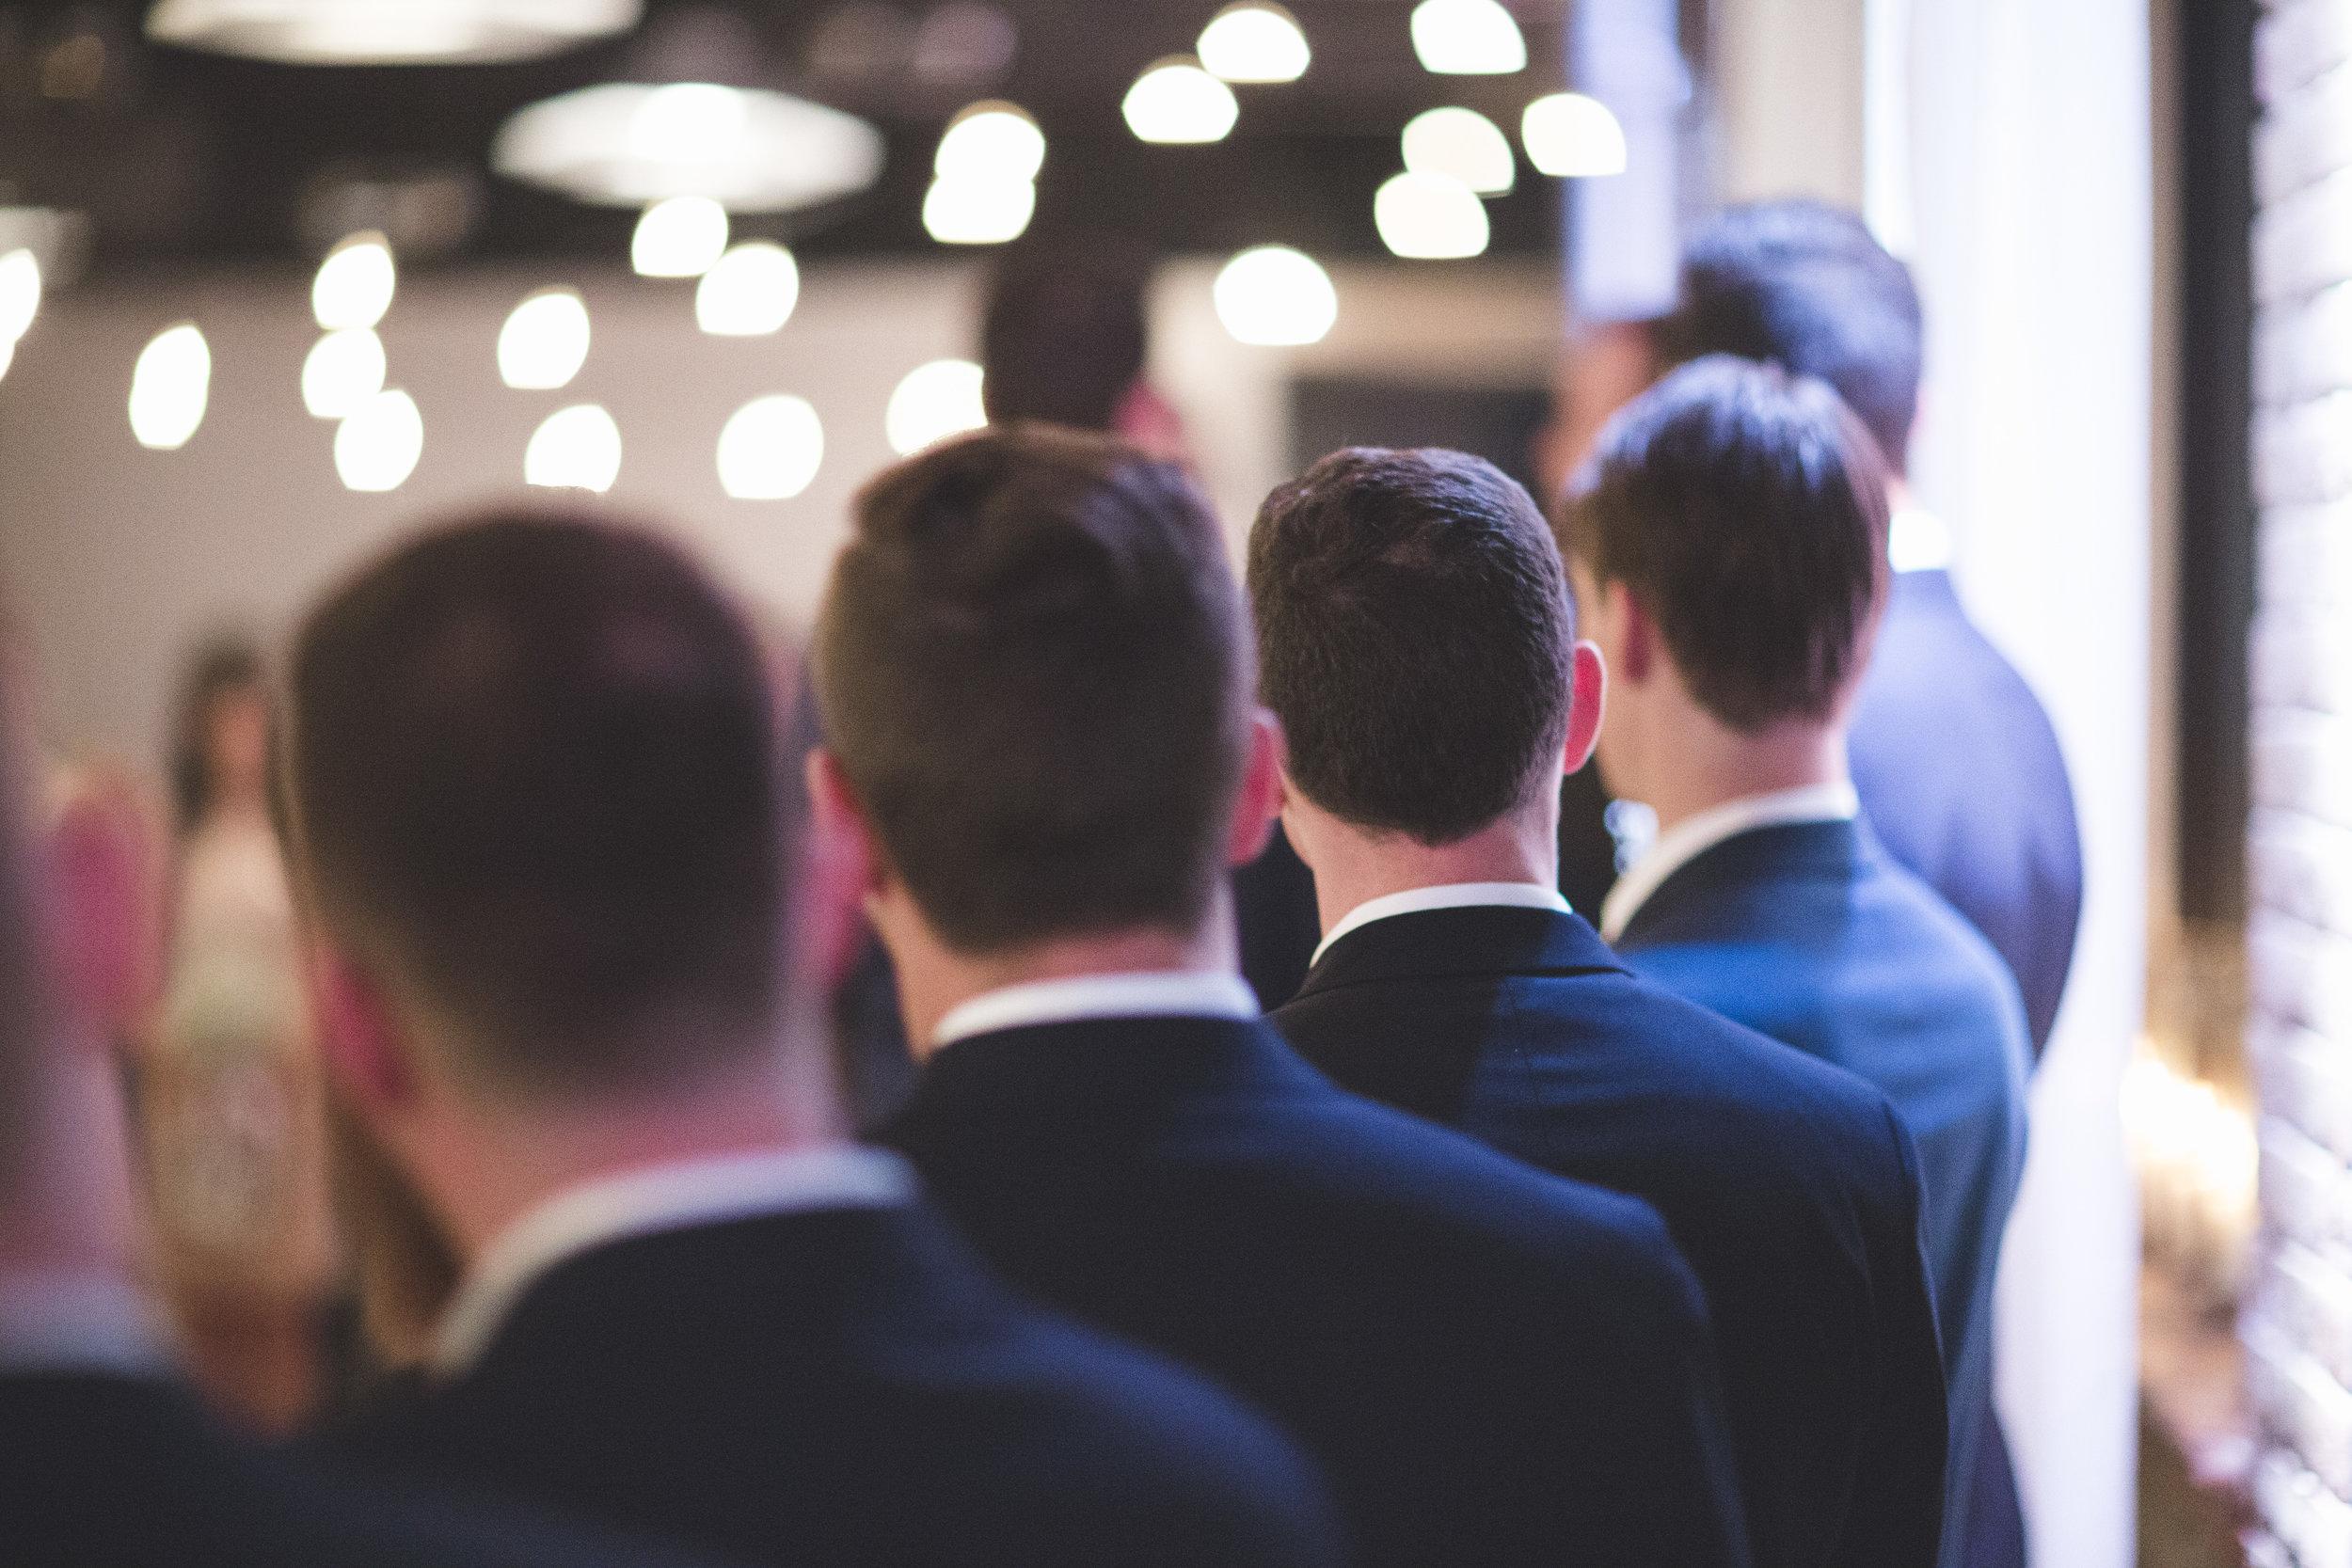 Groomsmen watching the wedding ceremony.